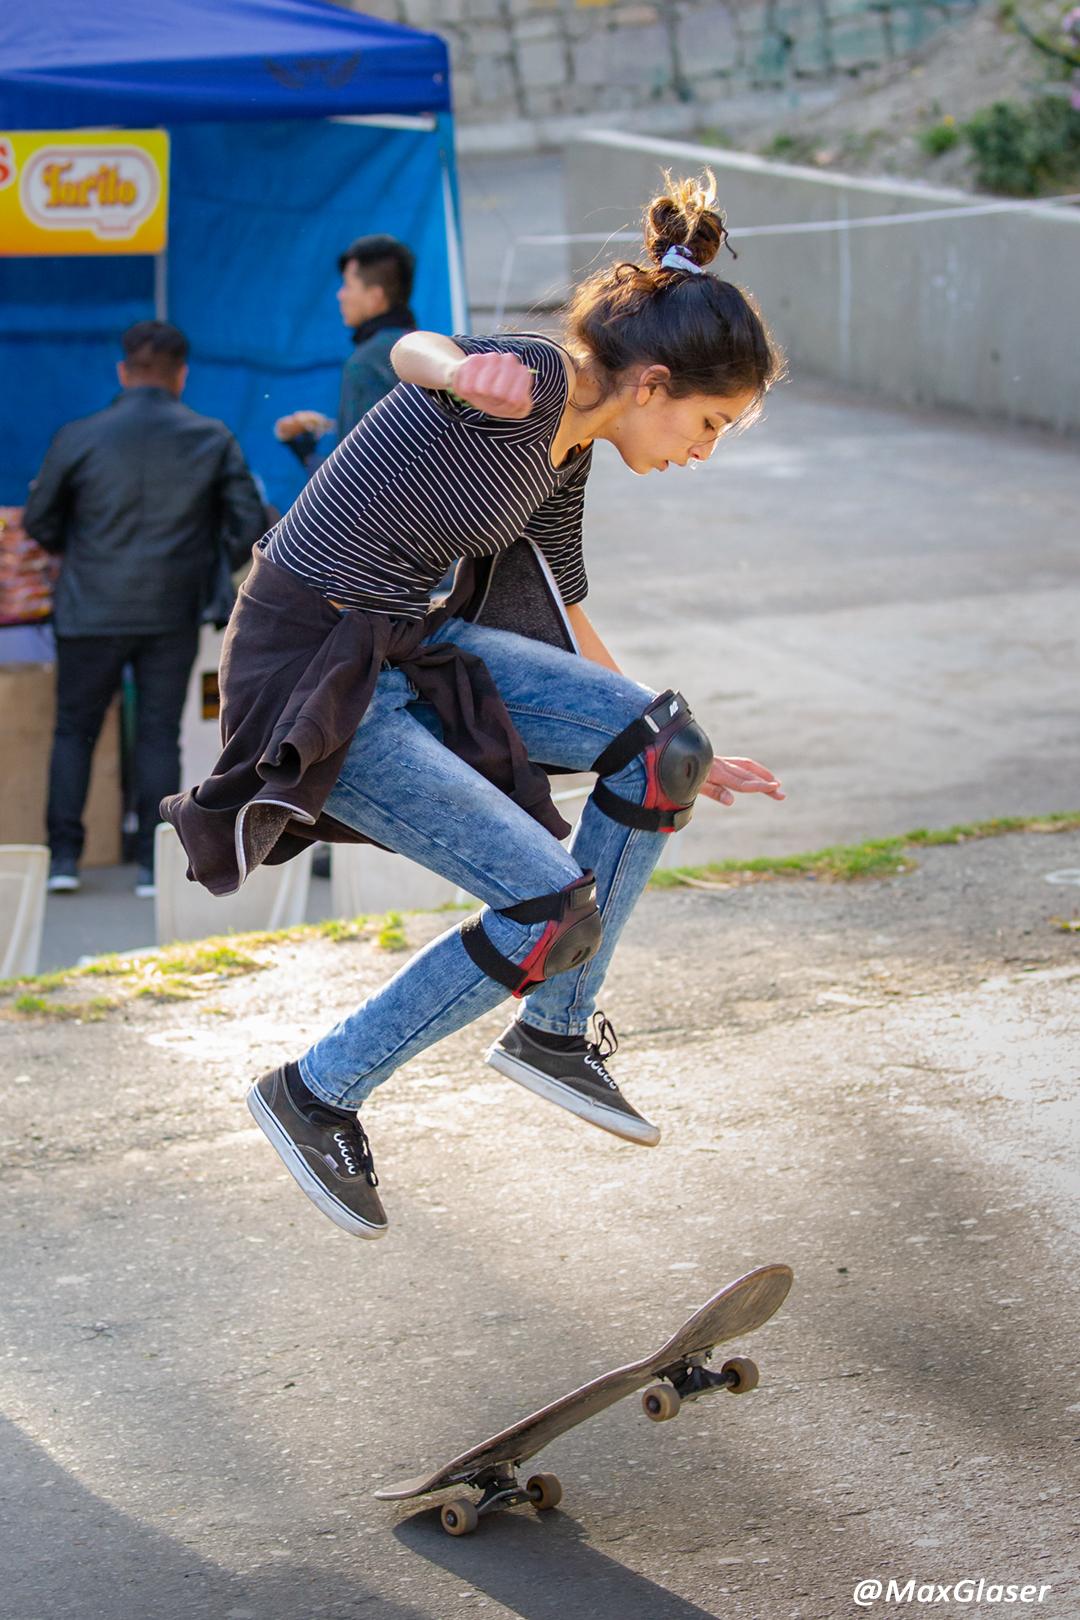 MegaFest 2018 - Espacio de skateboard